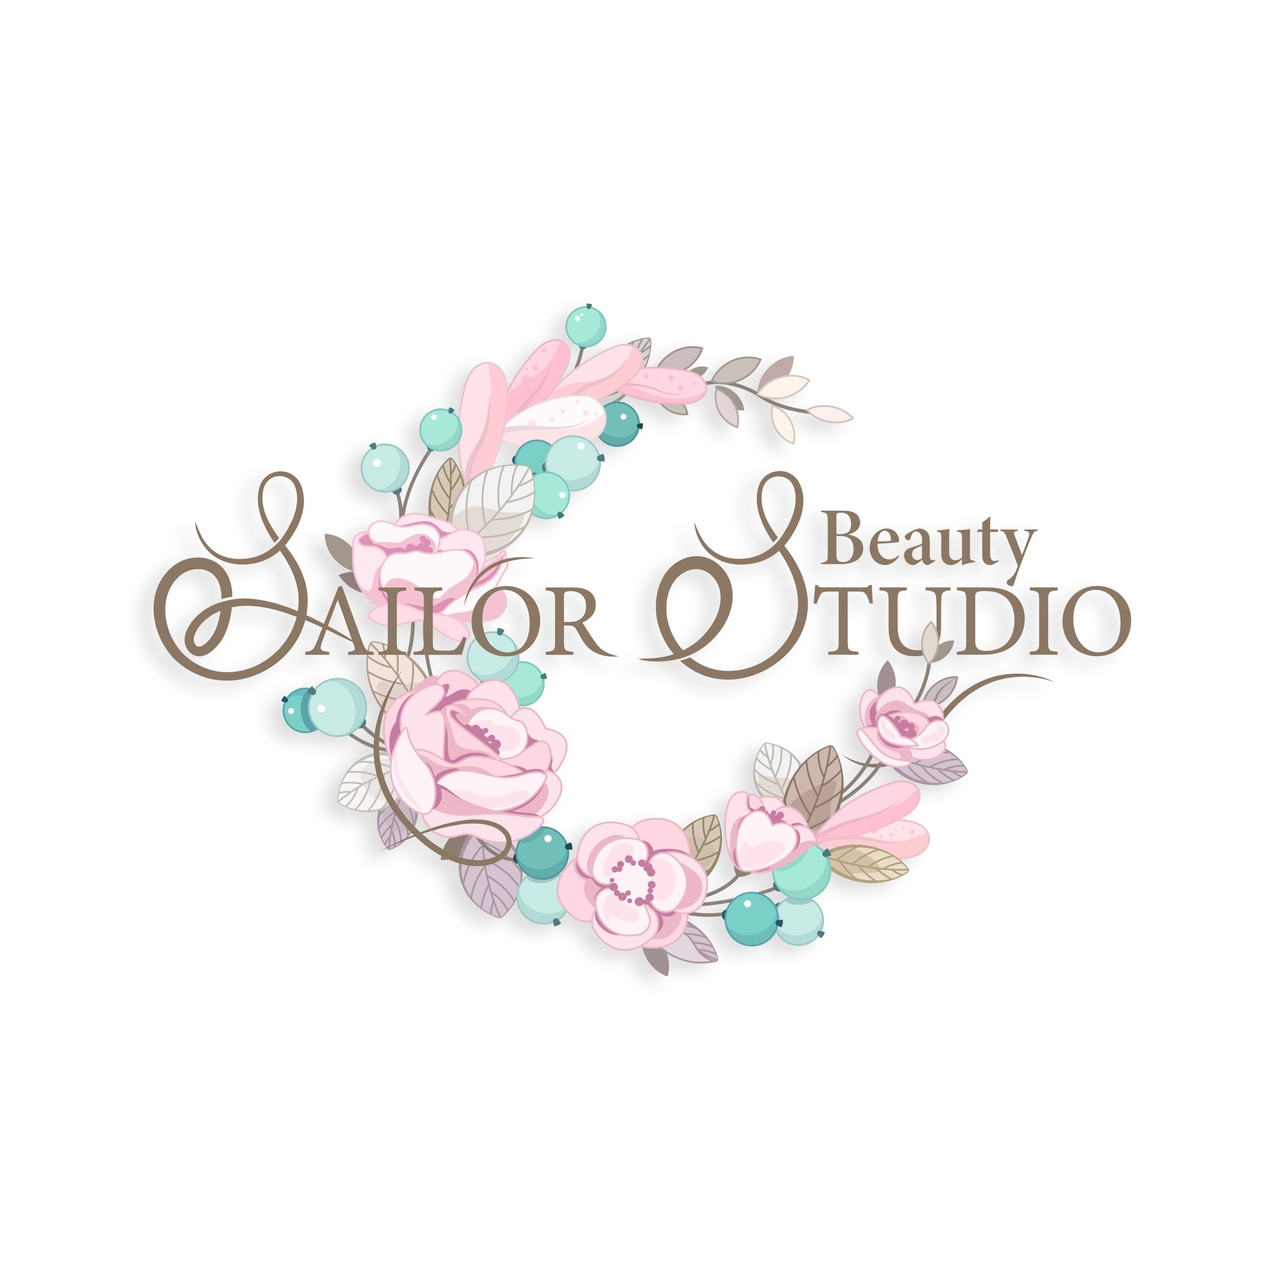 Студия красоты Sailor studio